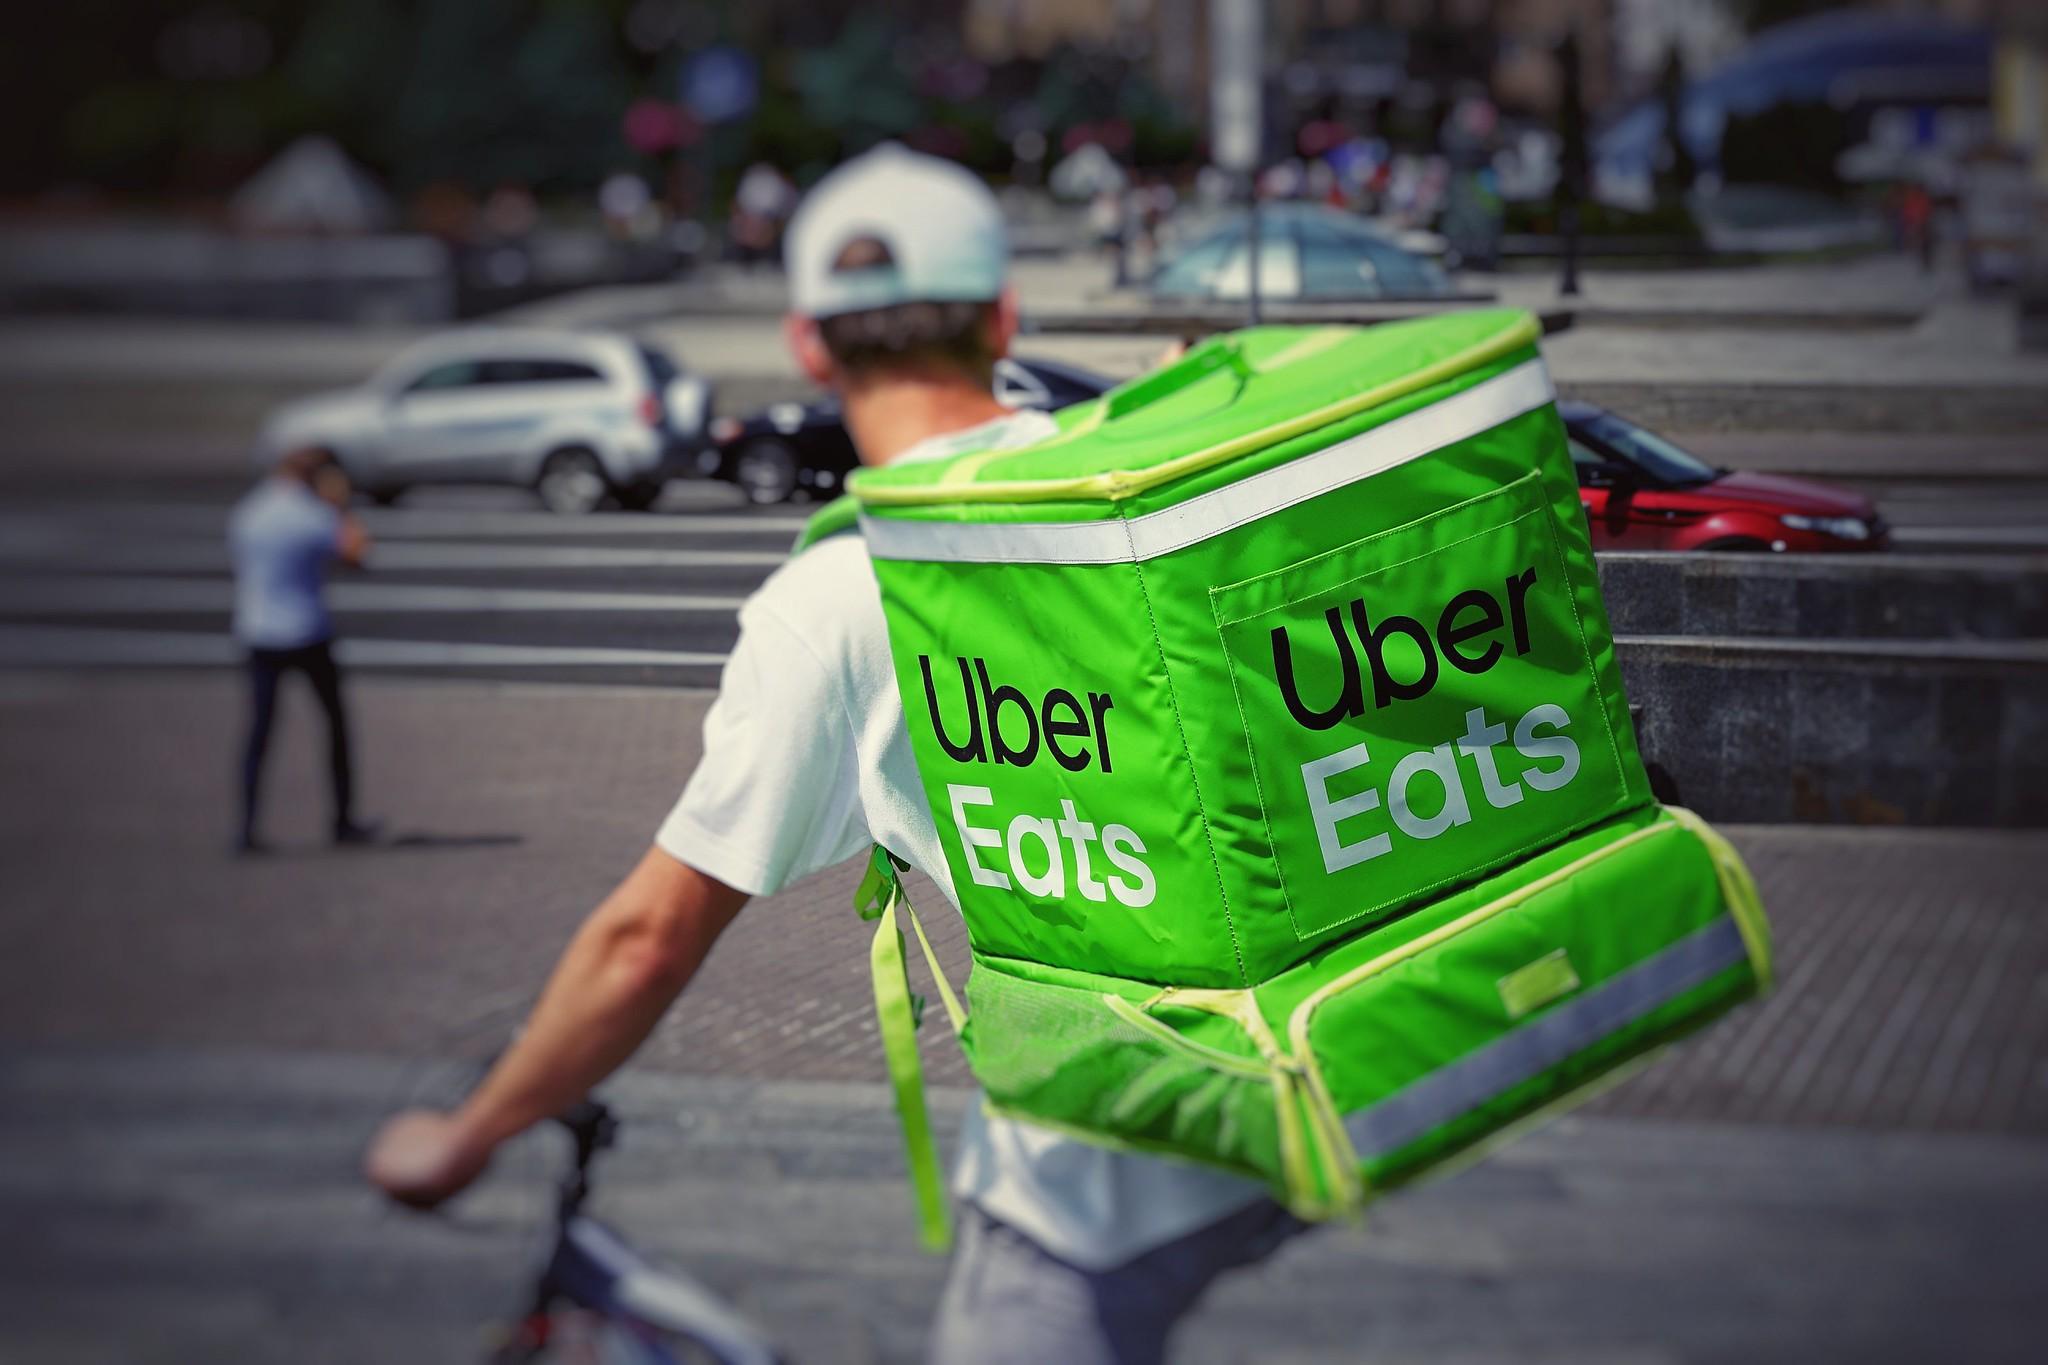 Uber Eats的送貨員。(圖片來源:Robert Anasch / Unsplash)